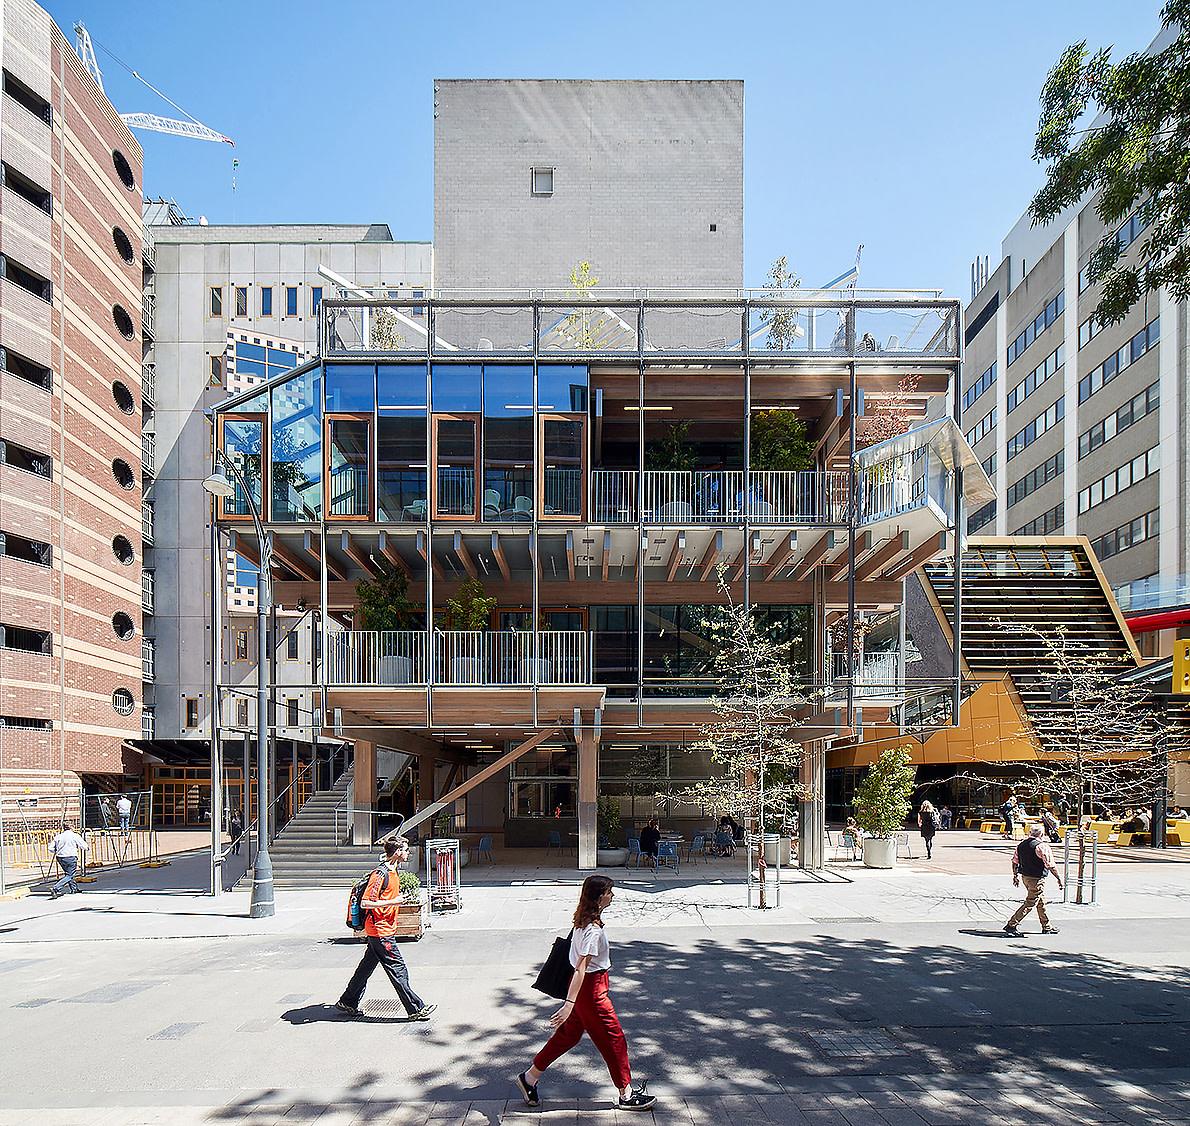 2018 Victorian Architecture Awards Shortlist announced